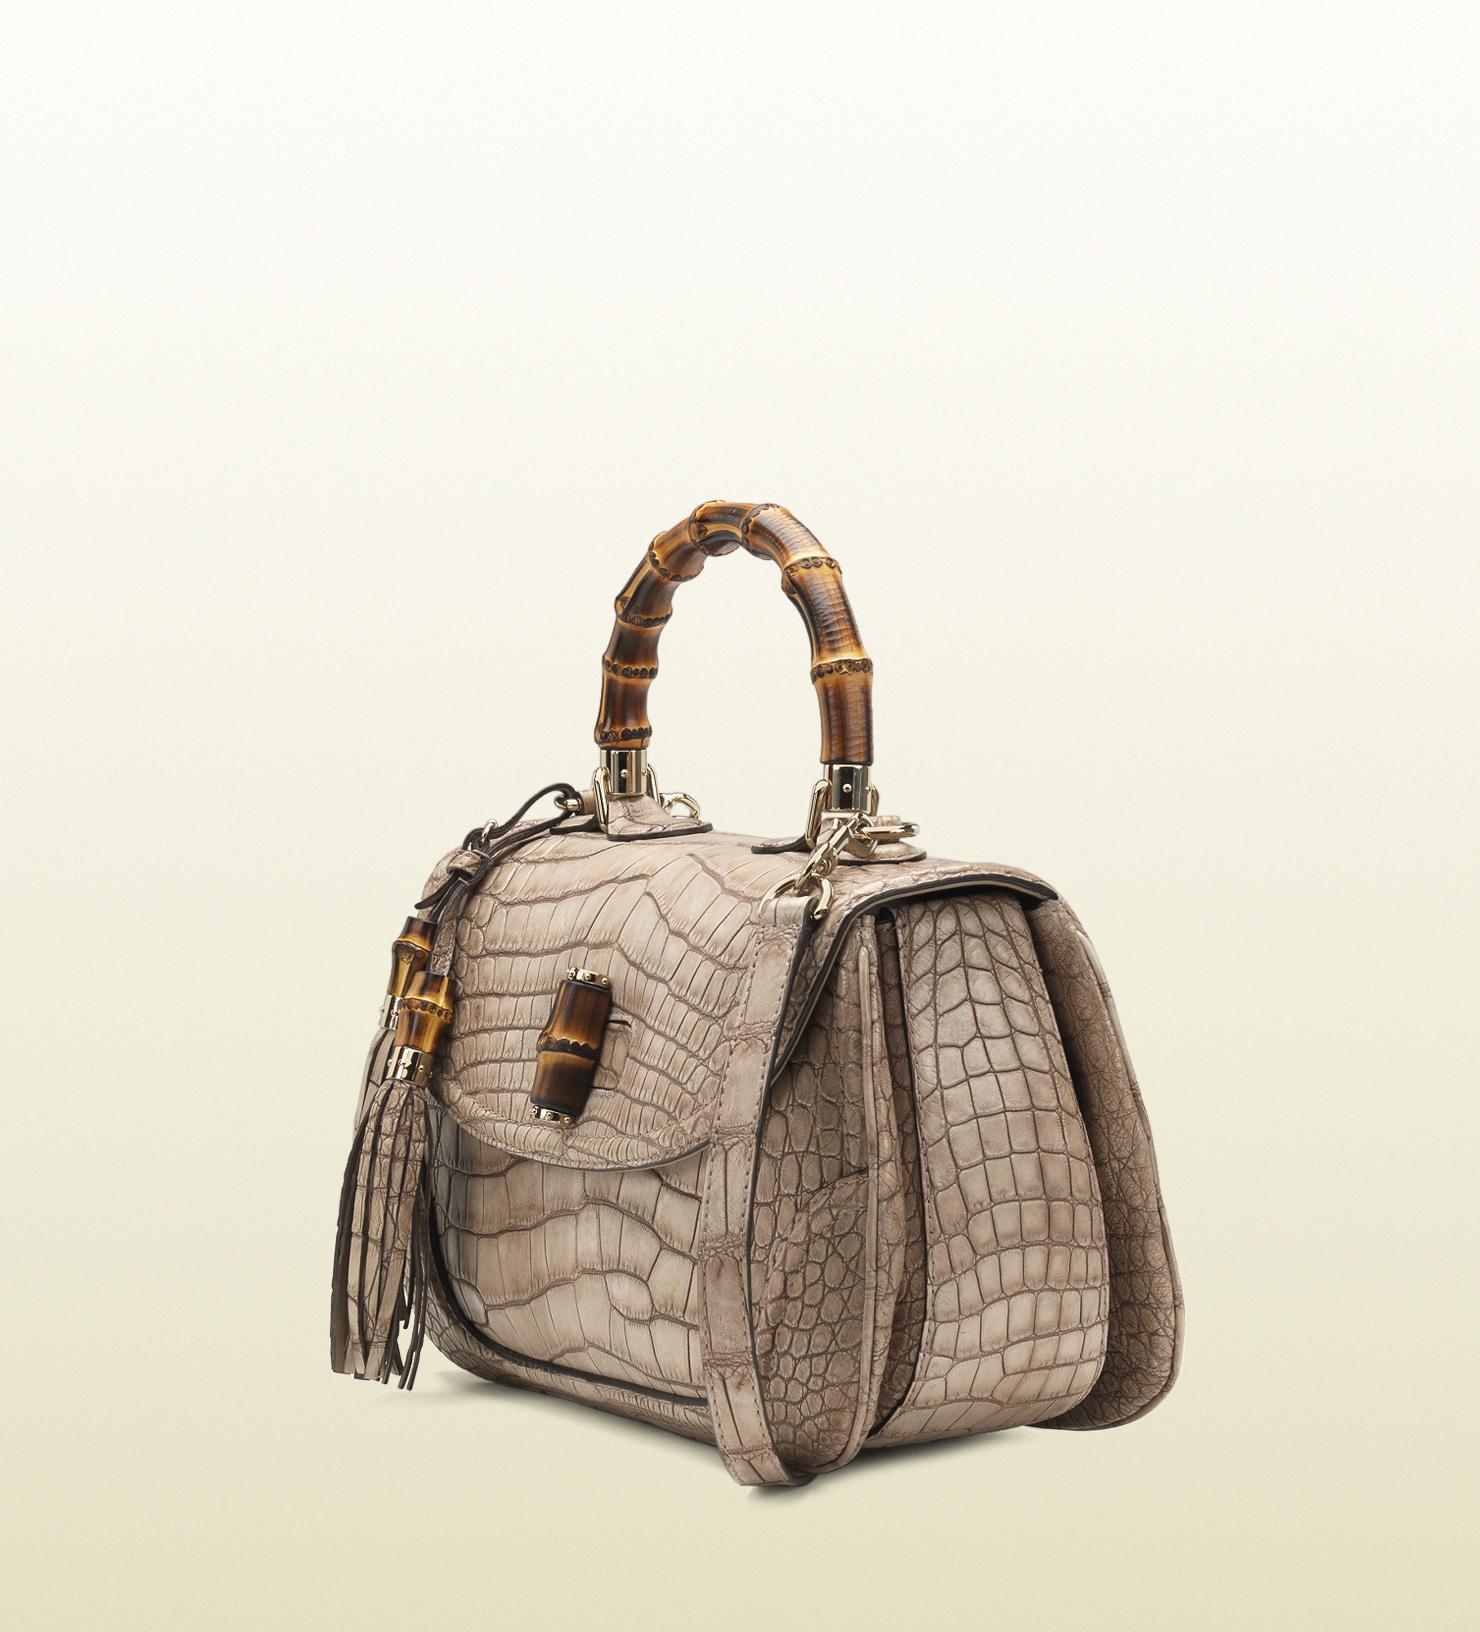 GucciWomen's Natural New Bamboo Crocodile Top Handle Bag